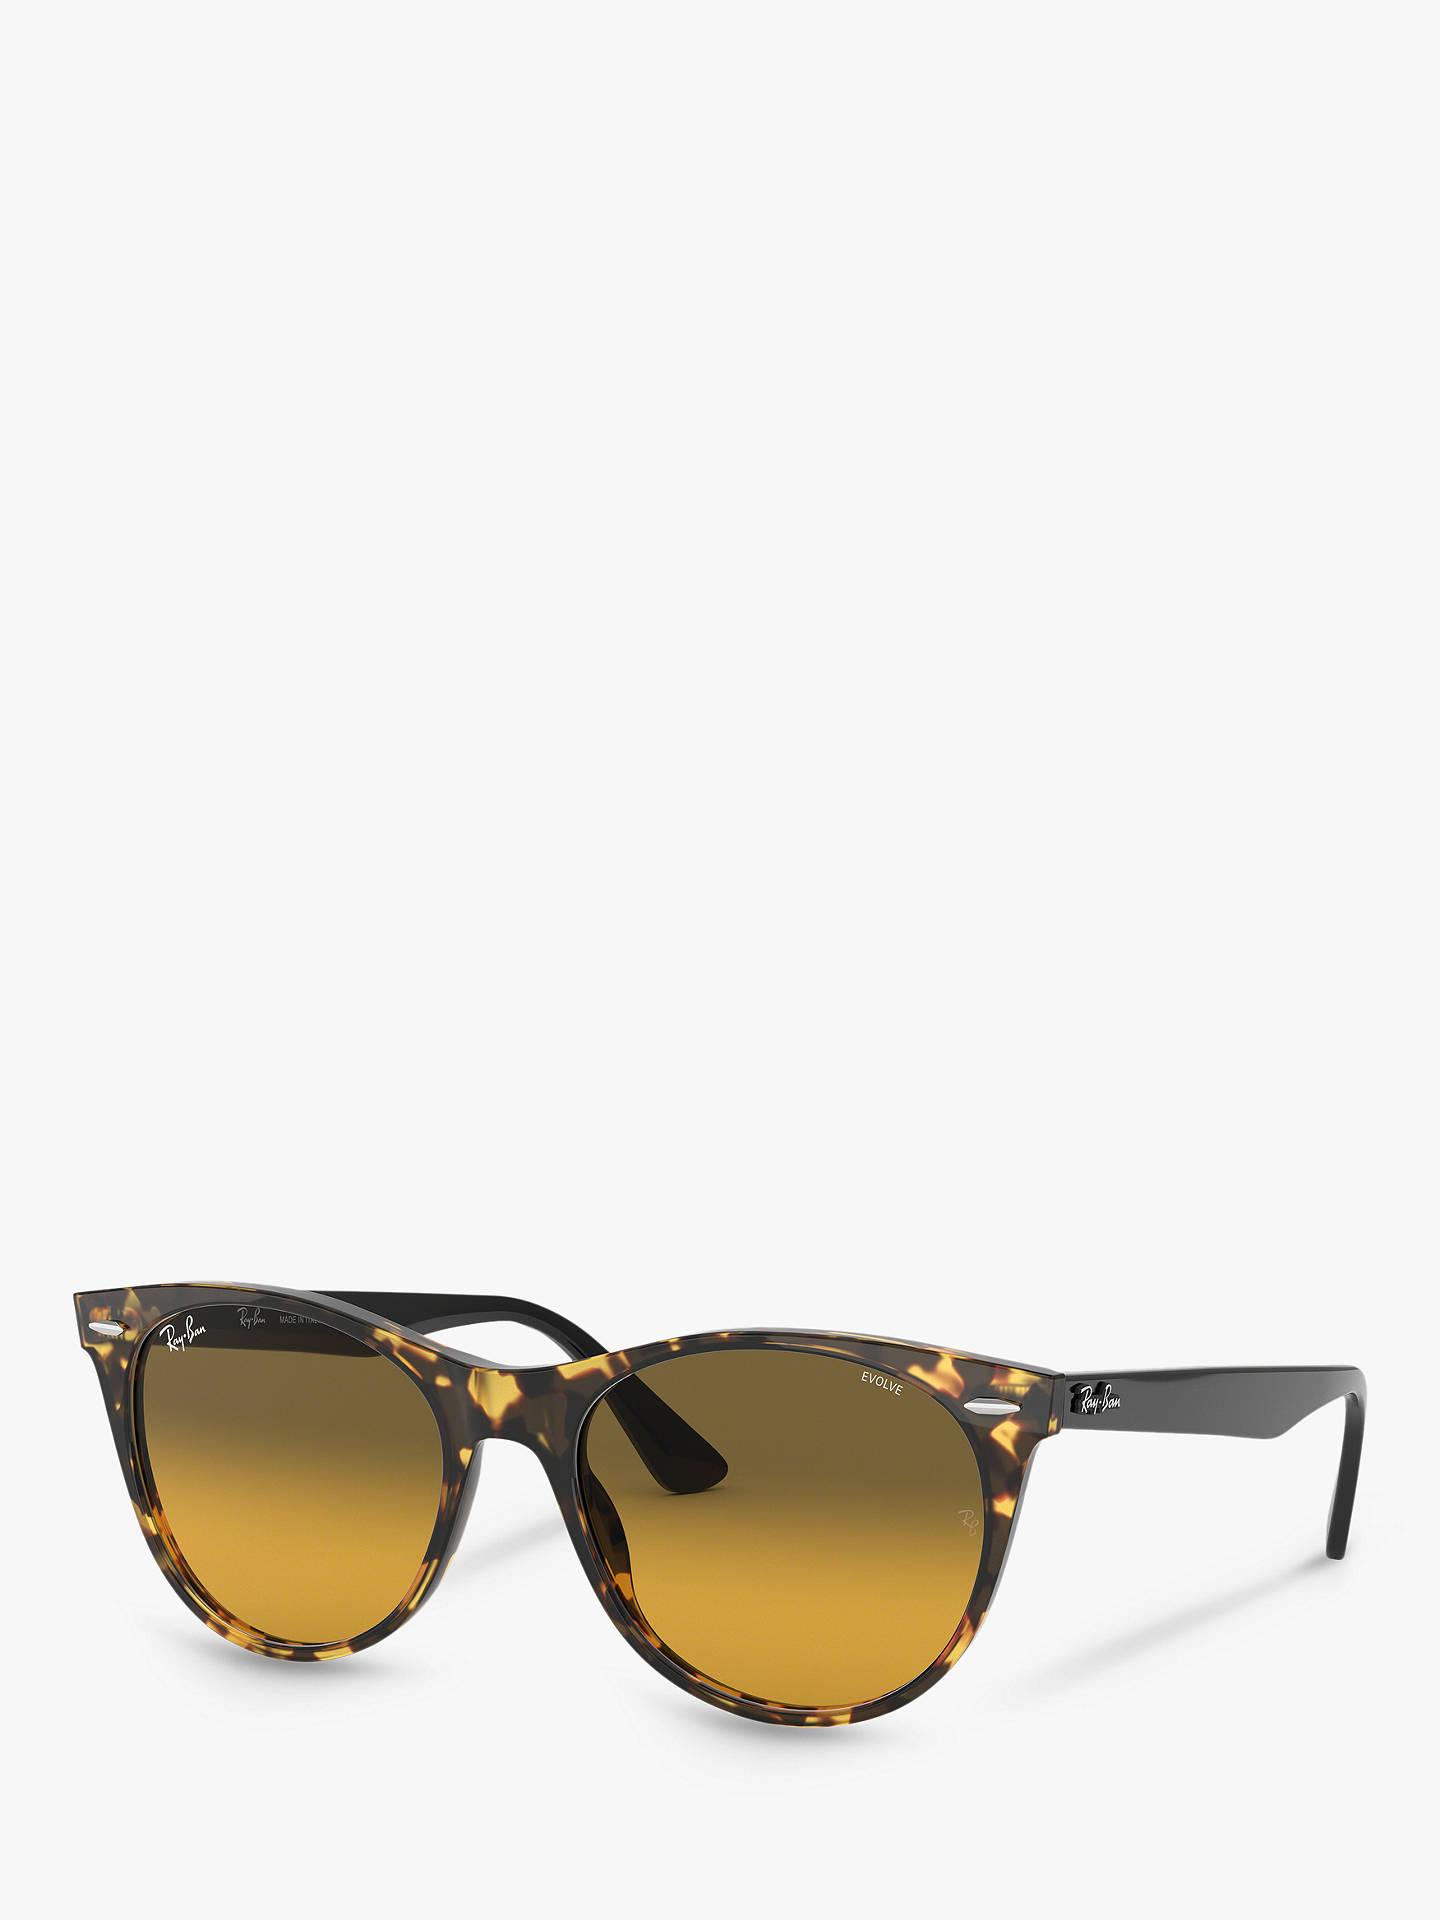 0450c8caad BuyRay-Ban RB2185 Women s Wayfarer Sunglasses